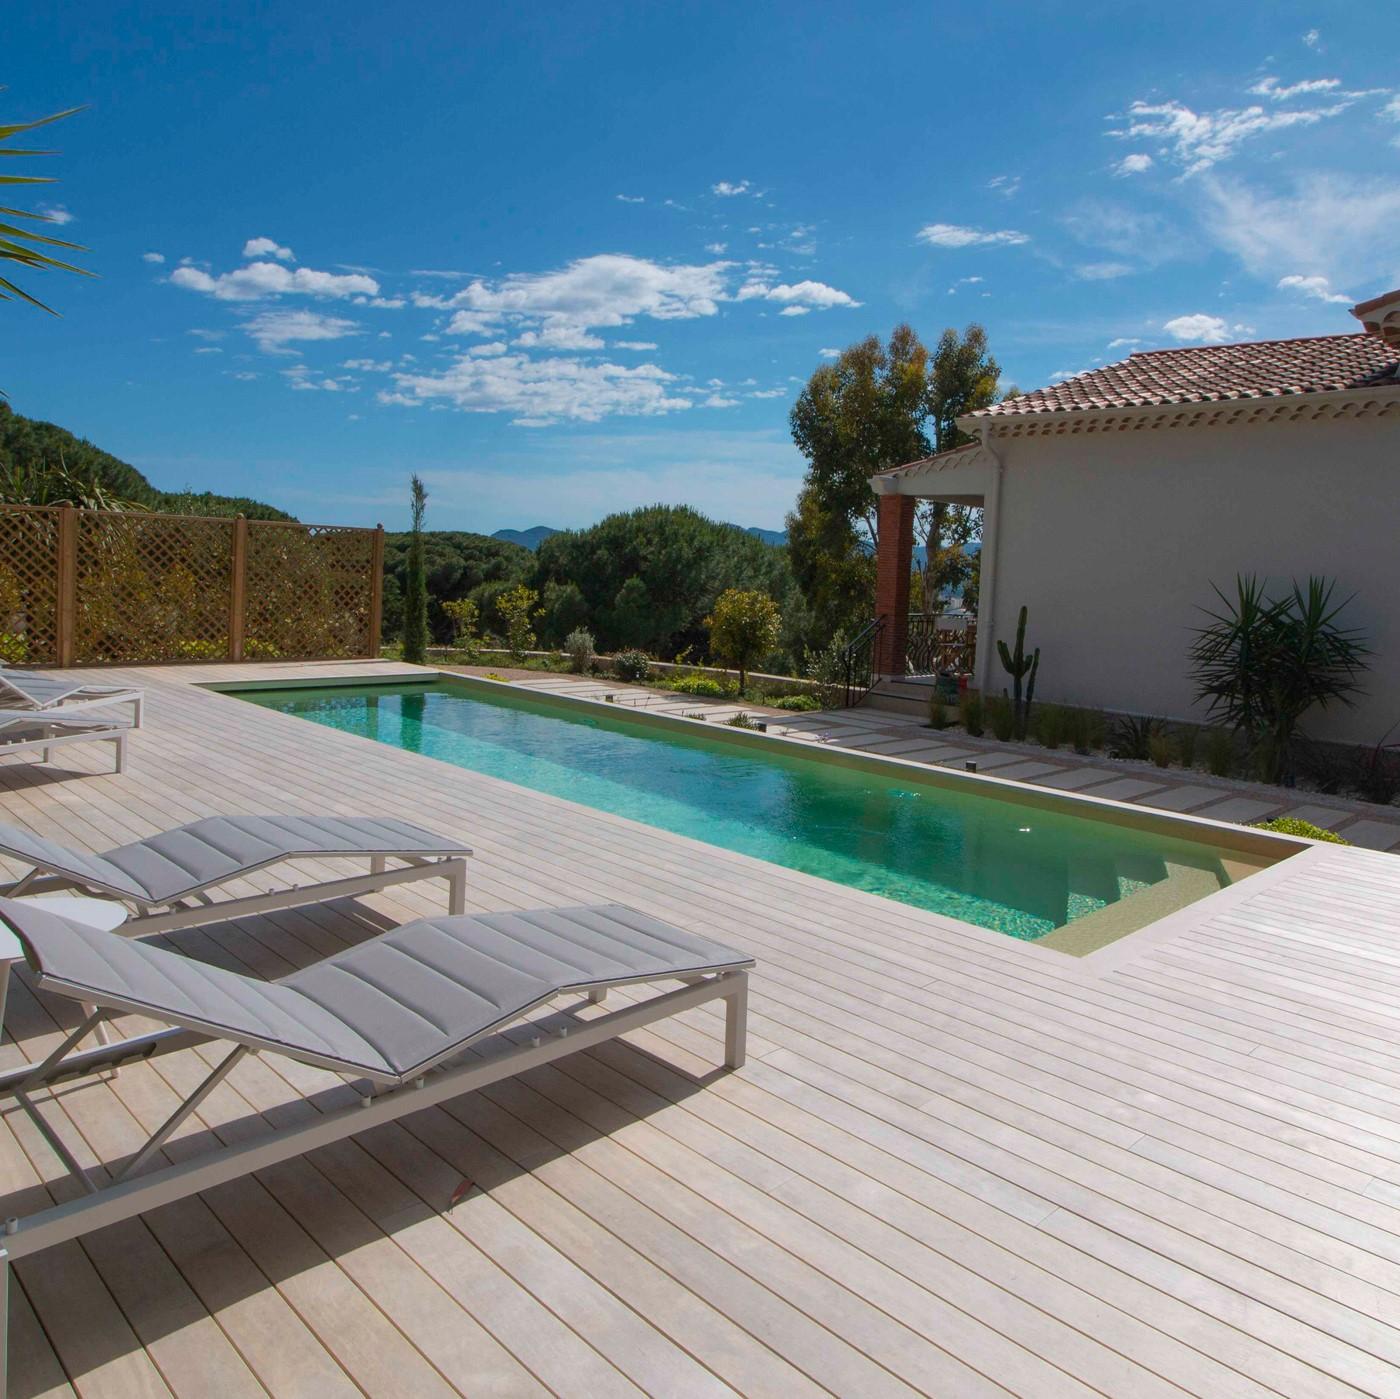 Accoya swimming pool deck in Cannes